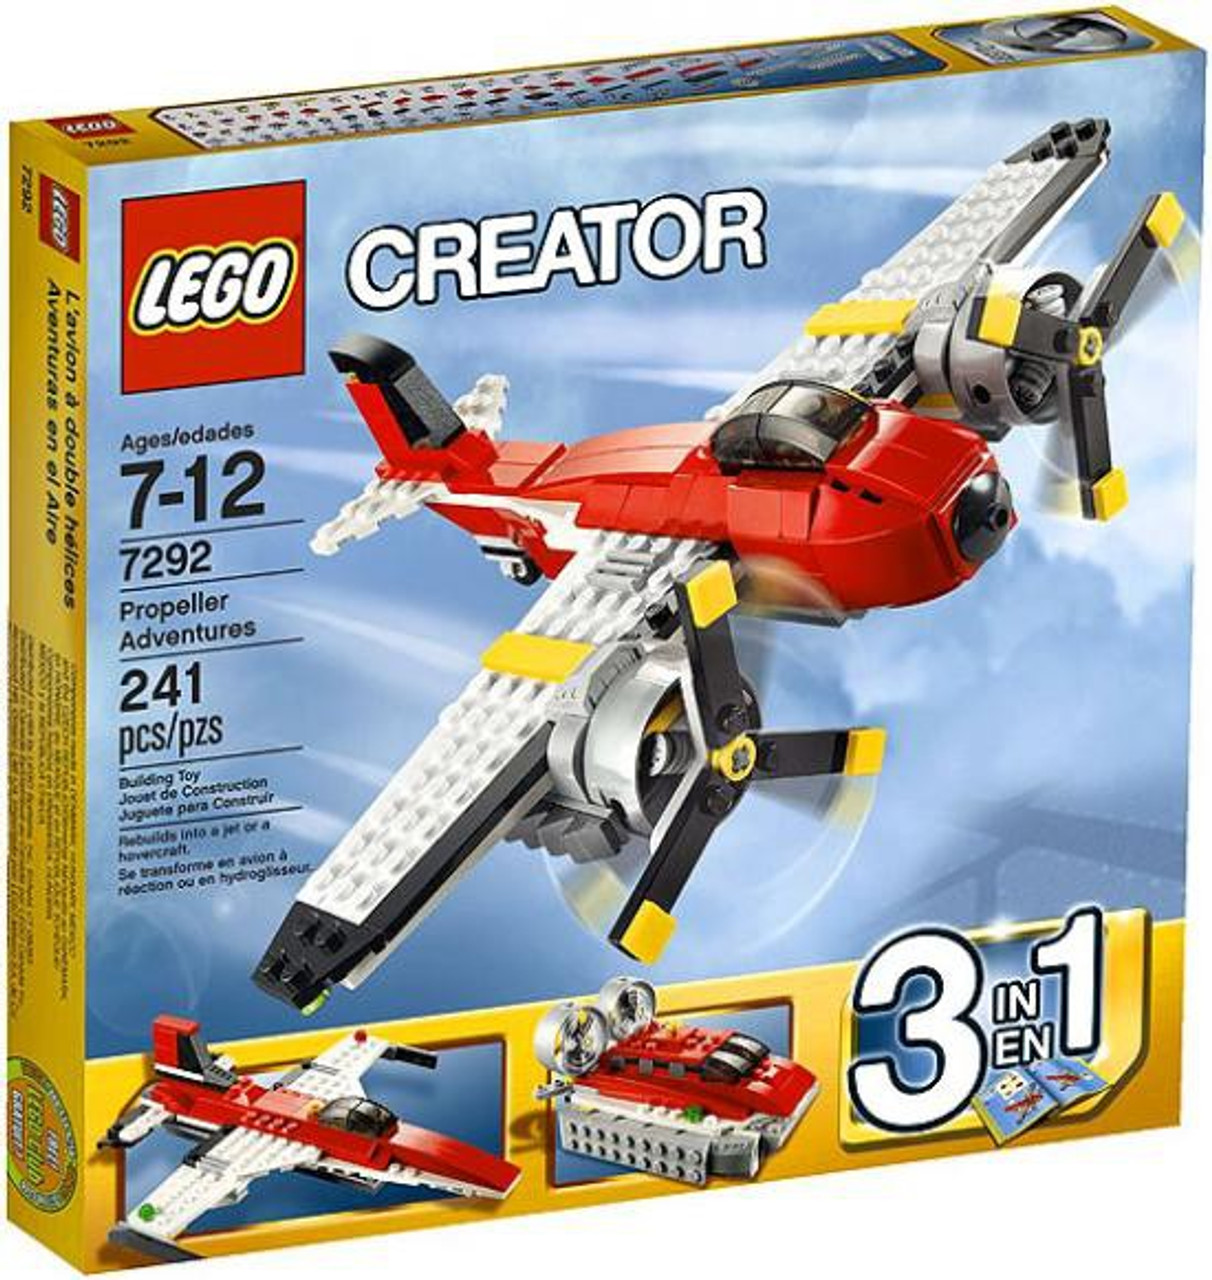 LEGO Creator Propeller Adventures Set #7292